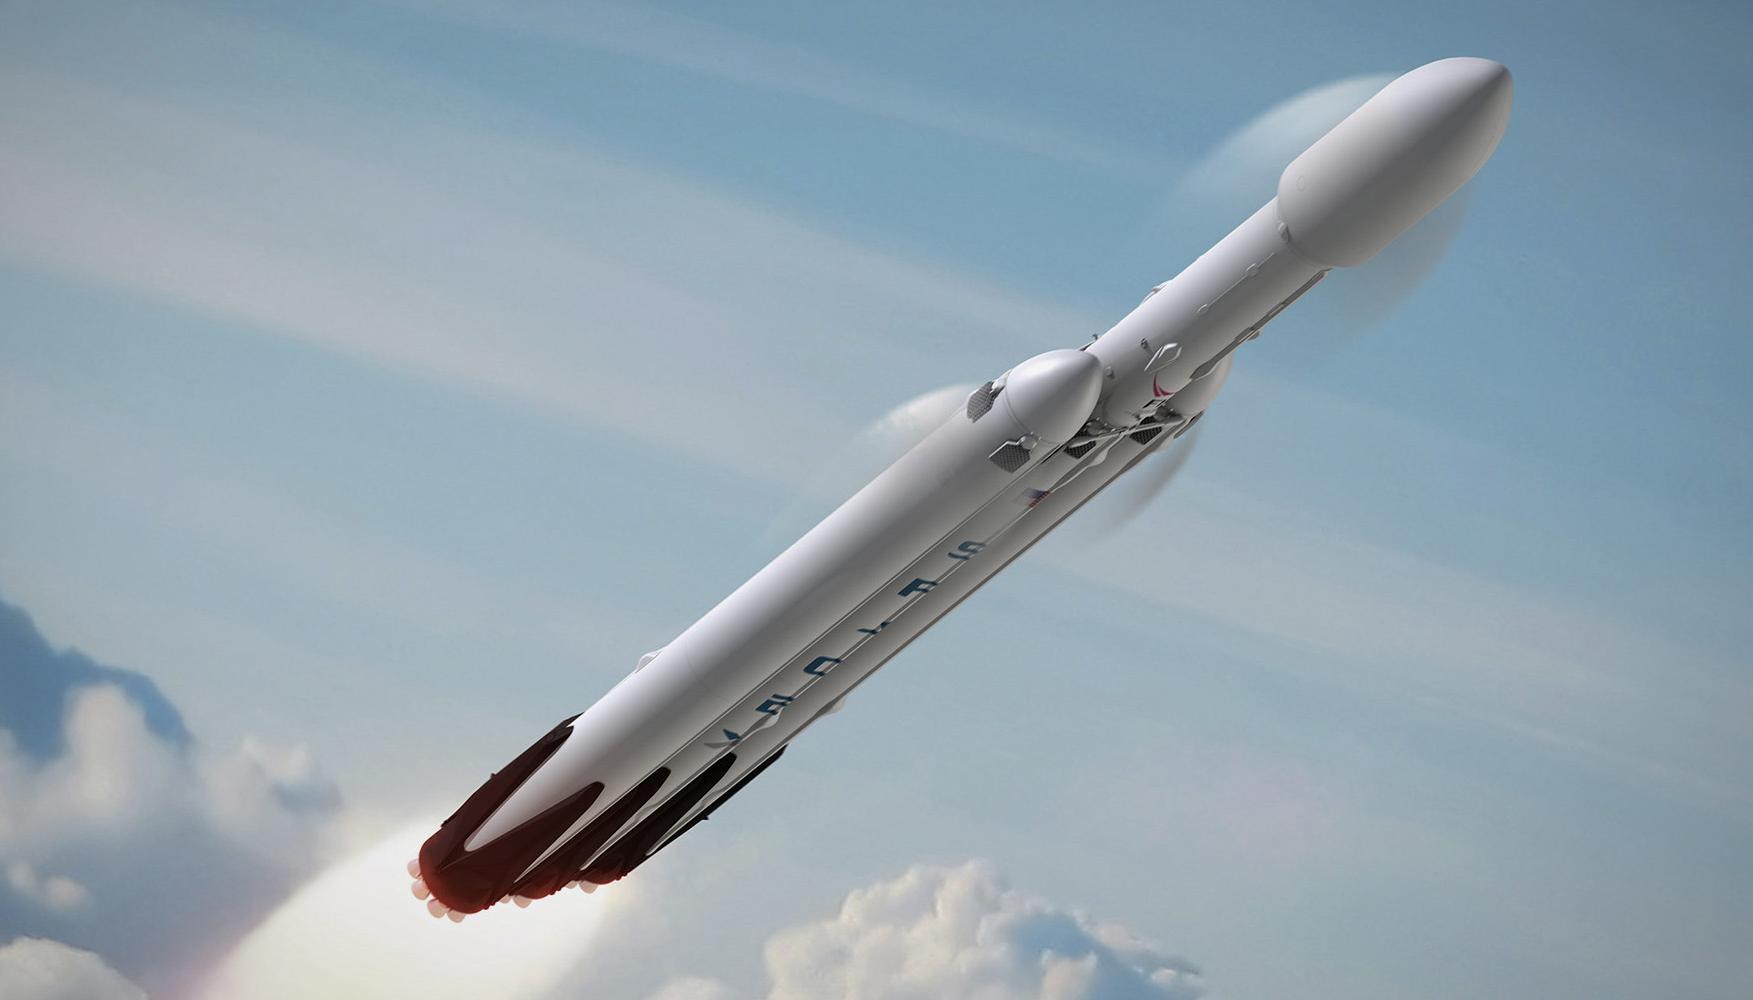 falcon heavy rocket concept-#main